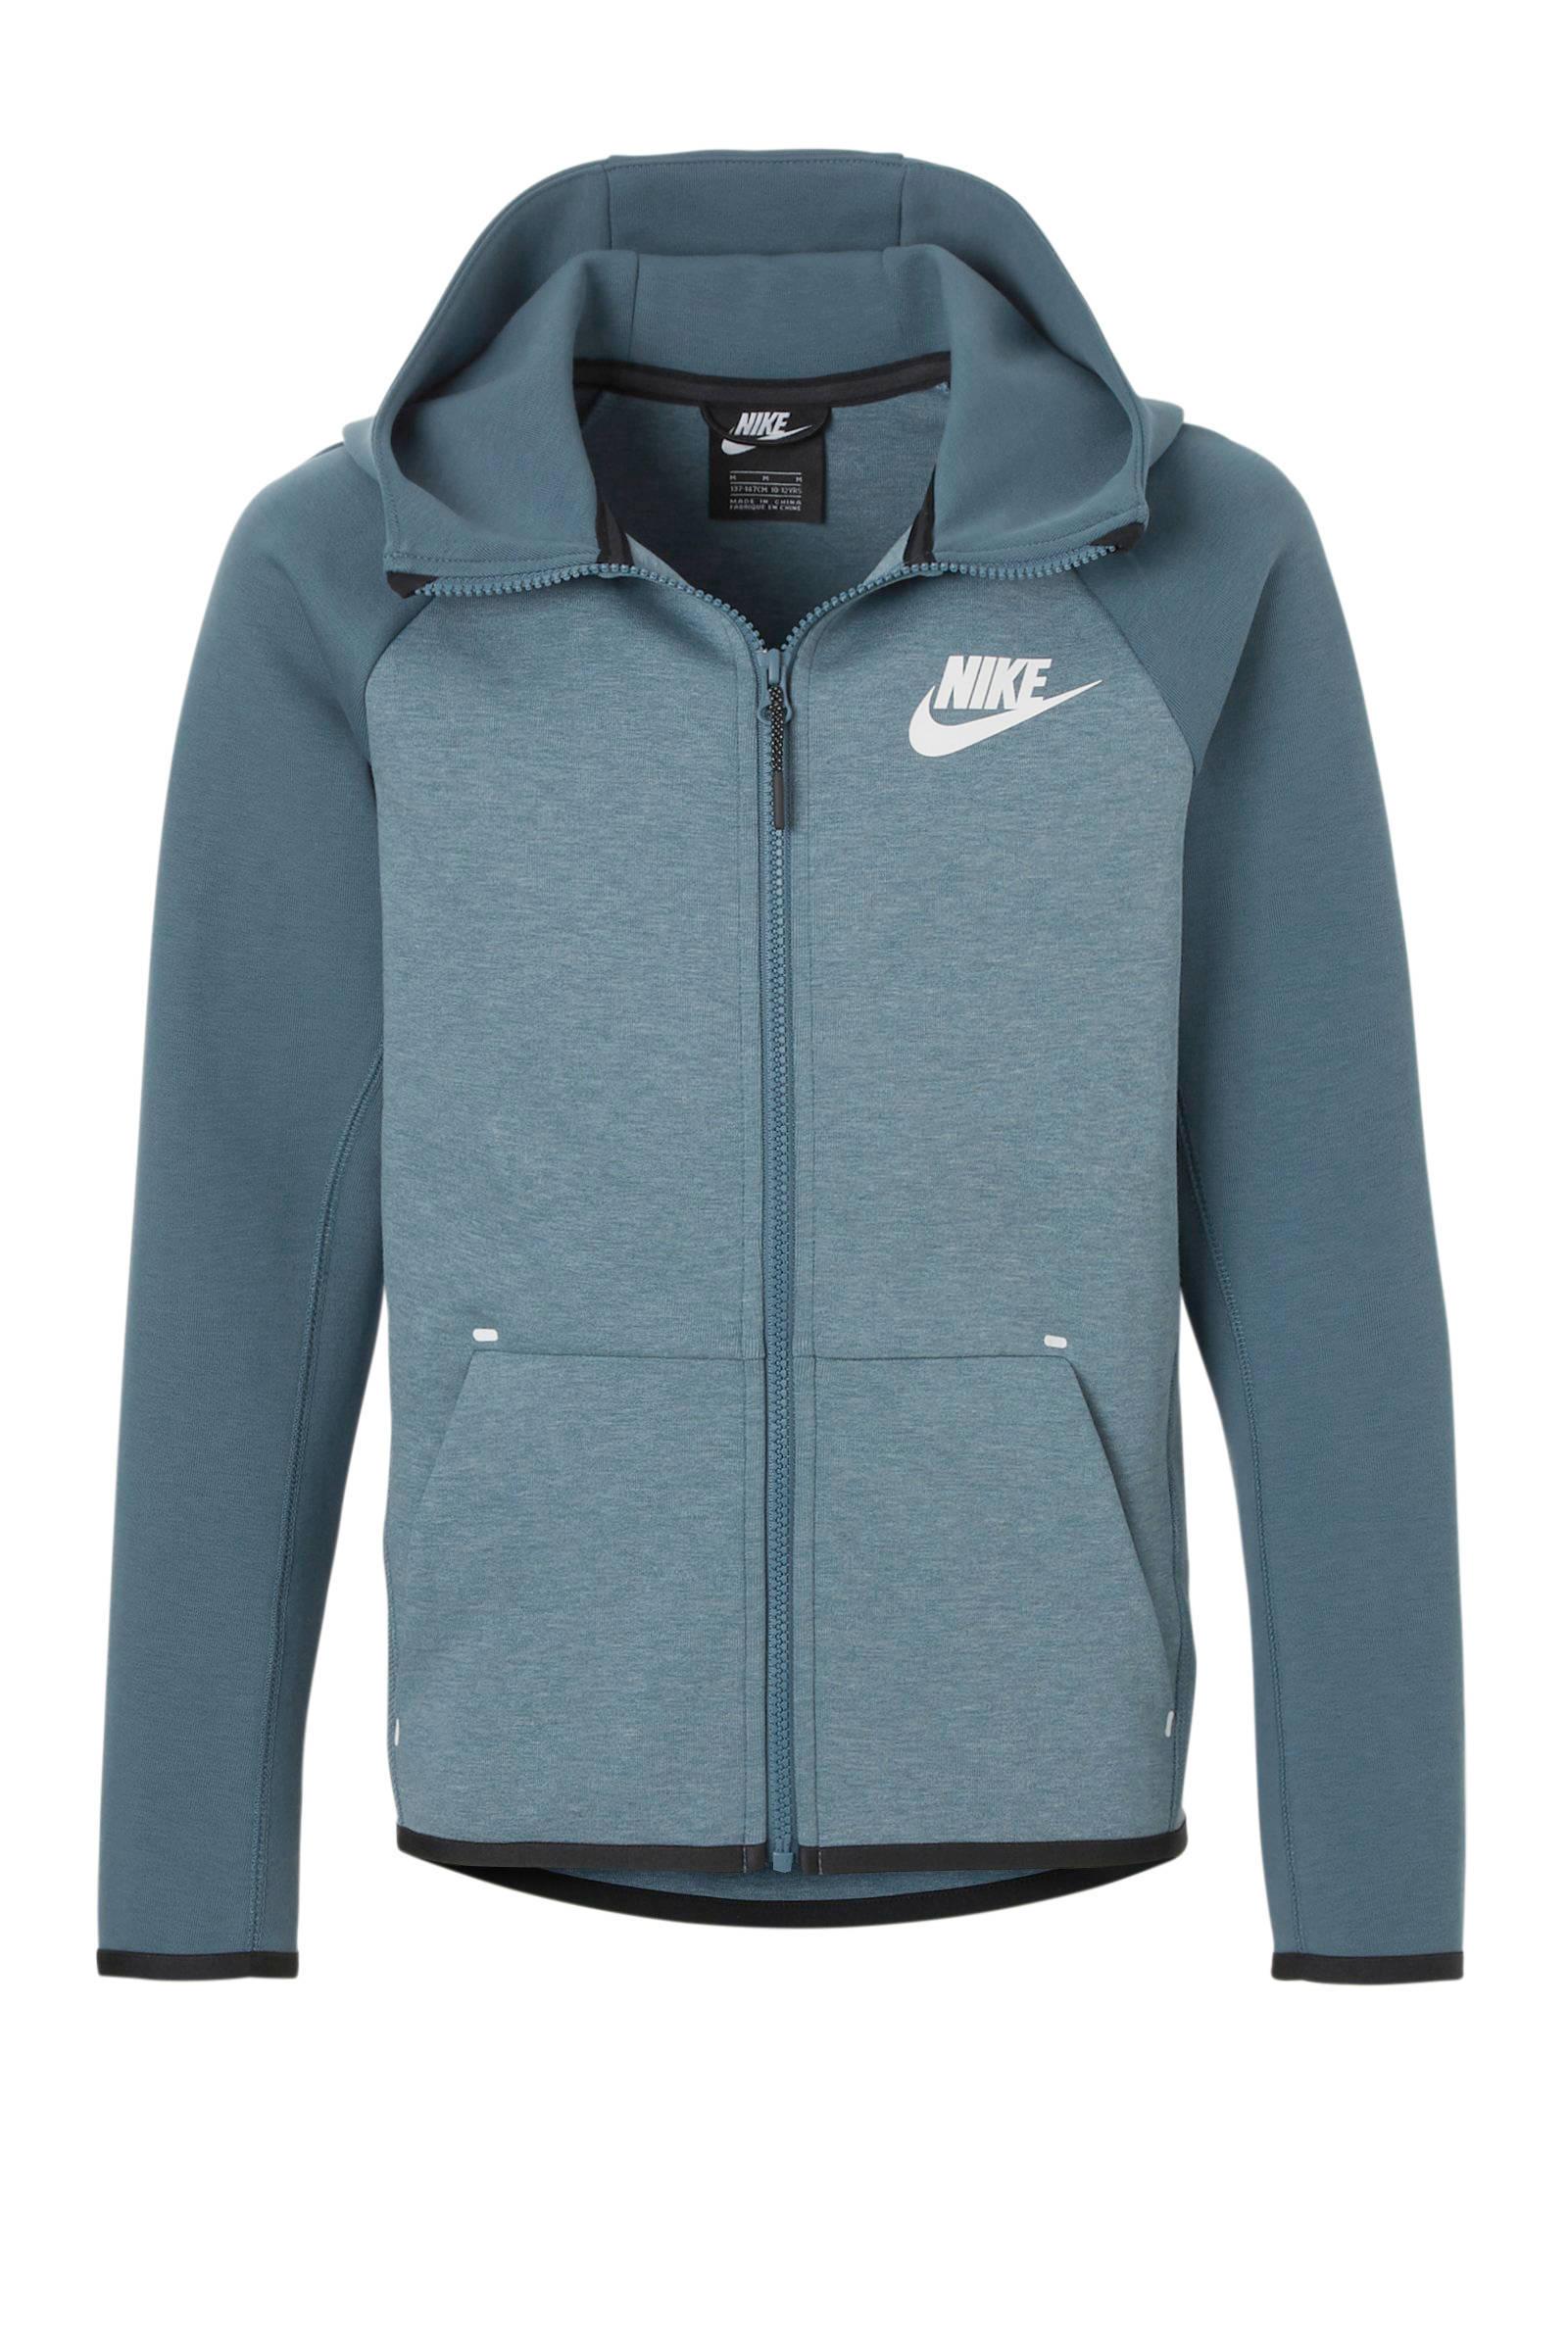 low priced 85867 da3e4 Nike kids bij wehkamp - Gratis bezorging vanaf 20.-